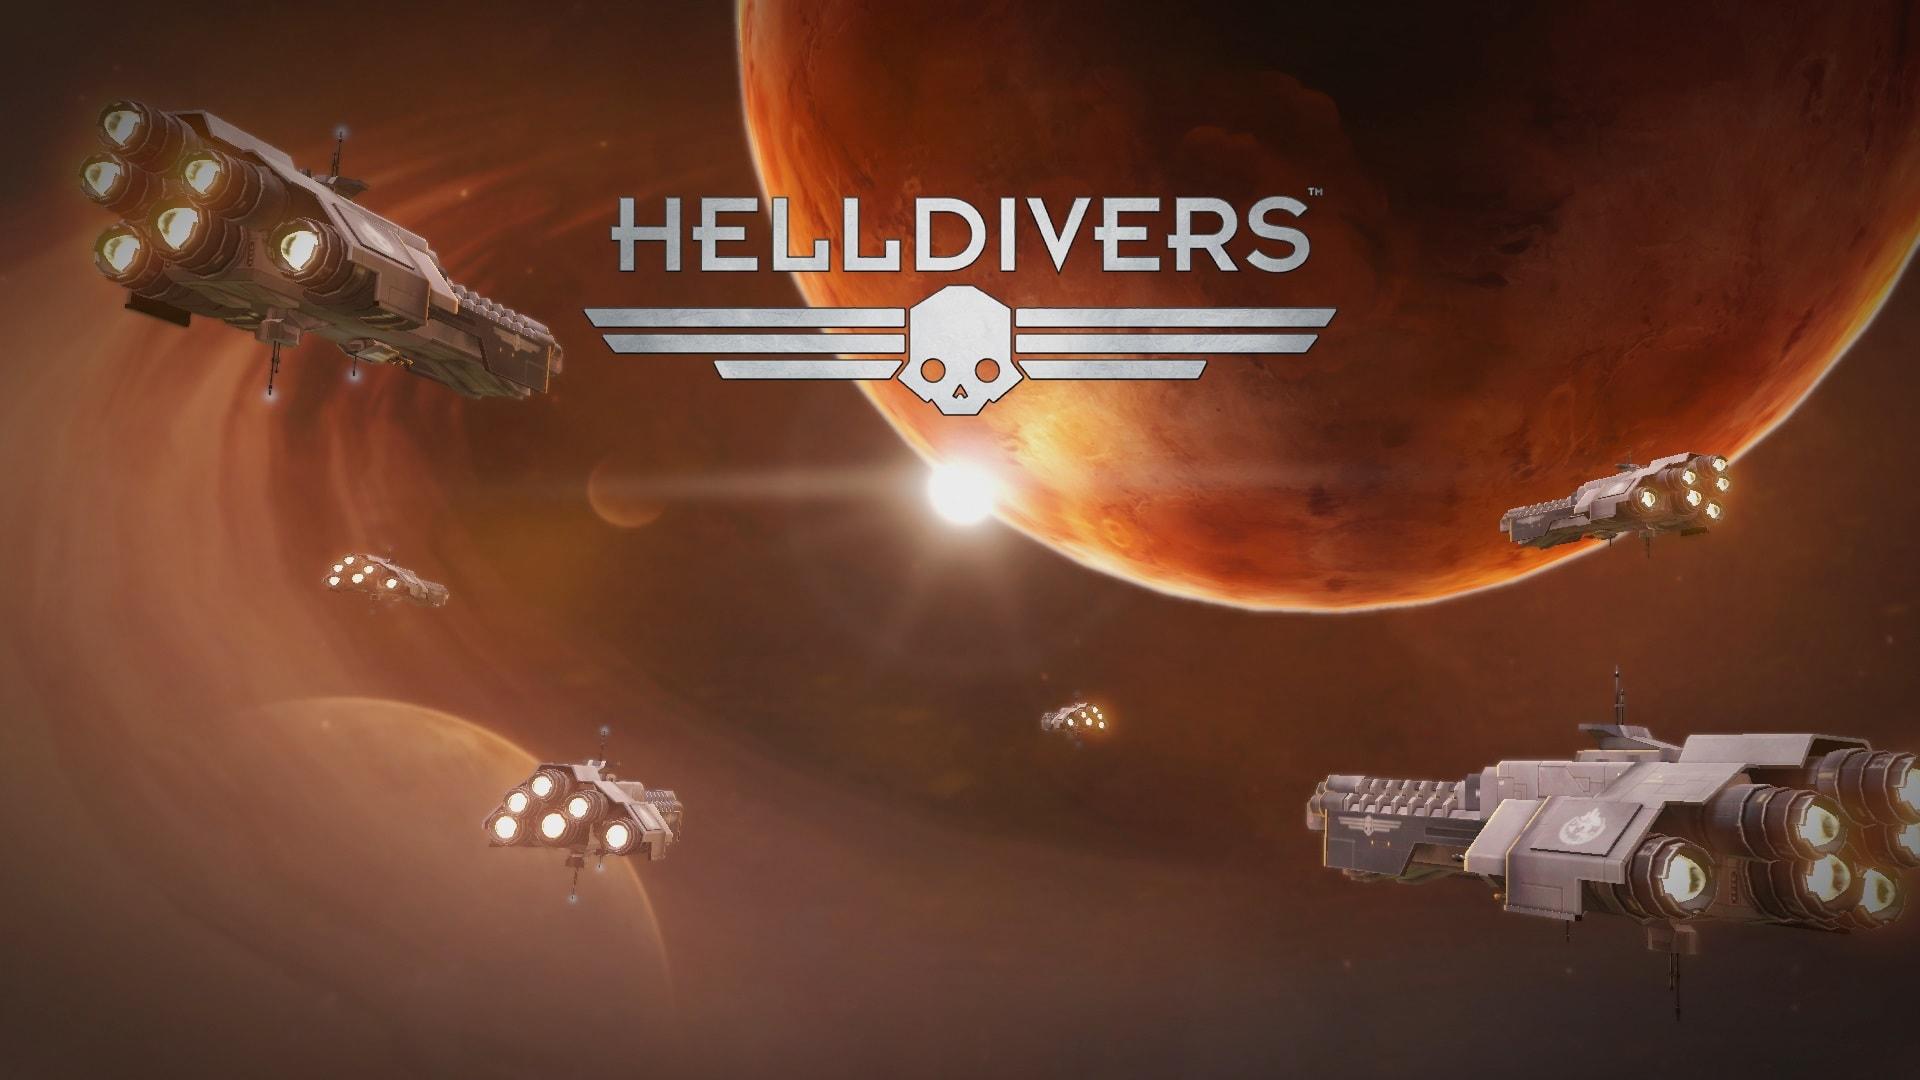 Helldivers Wallpapers hd